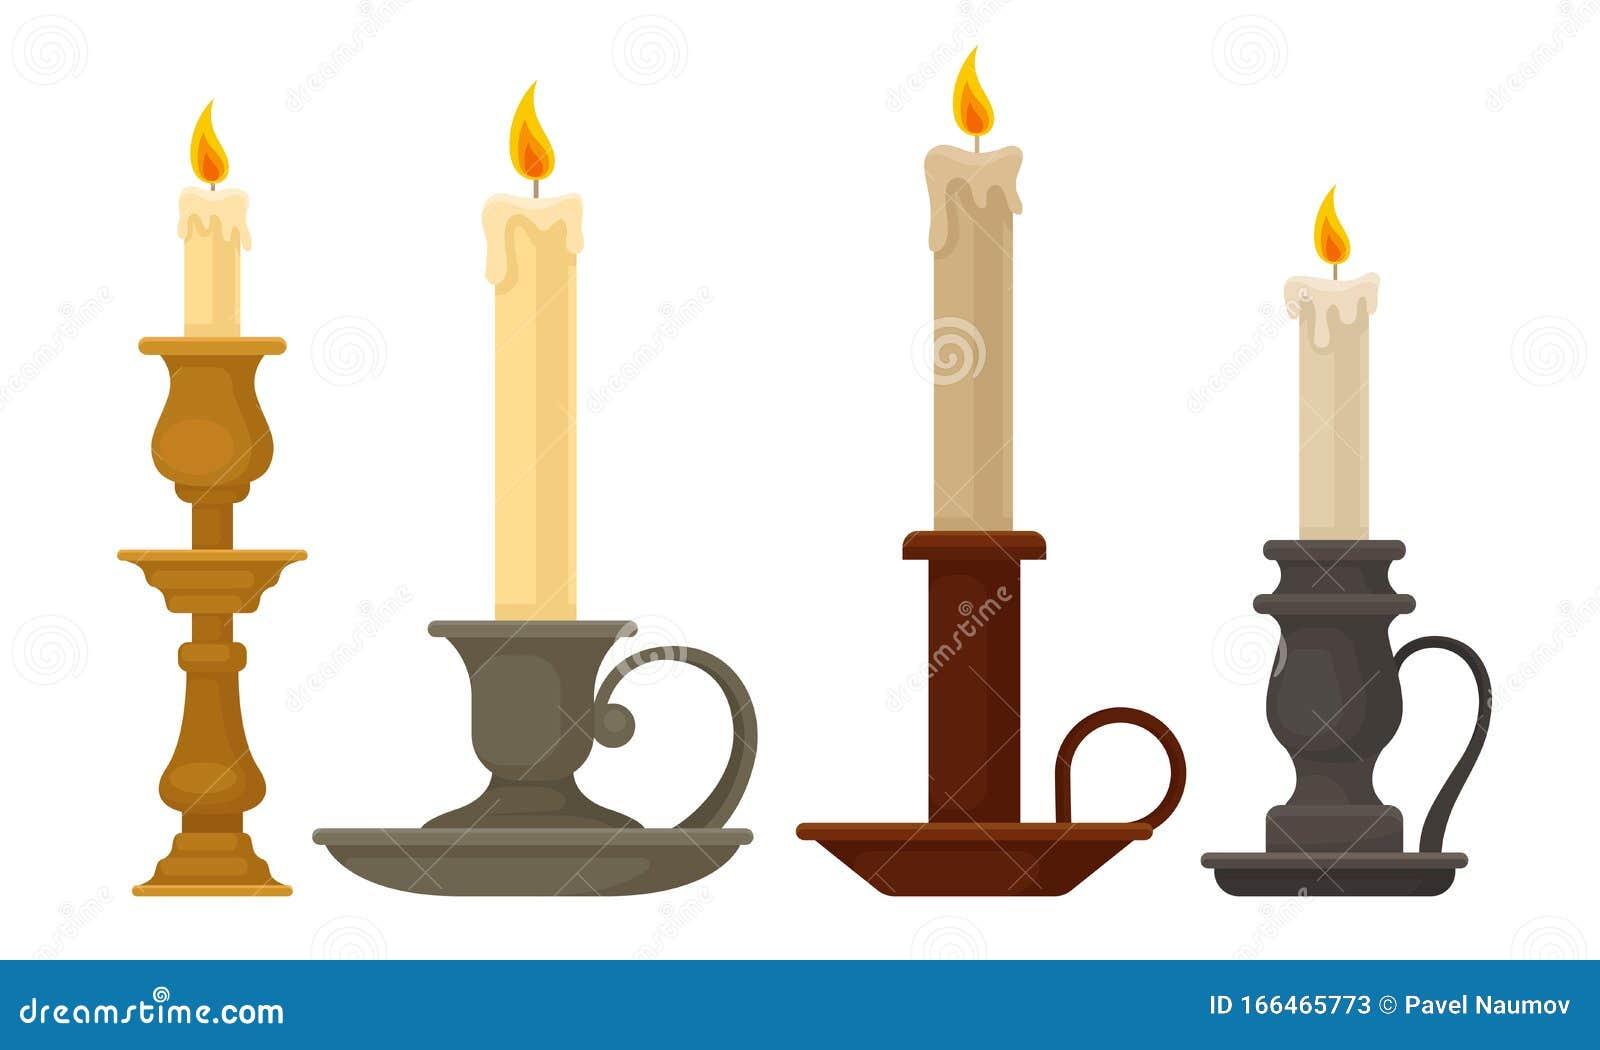 Candles In Candlesticks Vector Set Vintage Candle Holders And Candelabrums Stock Vector Illustration Of Light Design 166465773